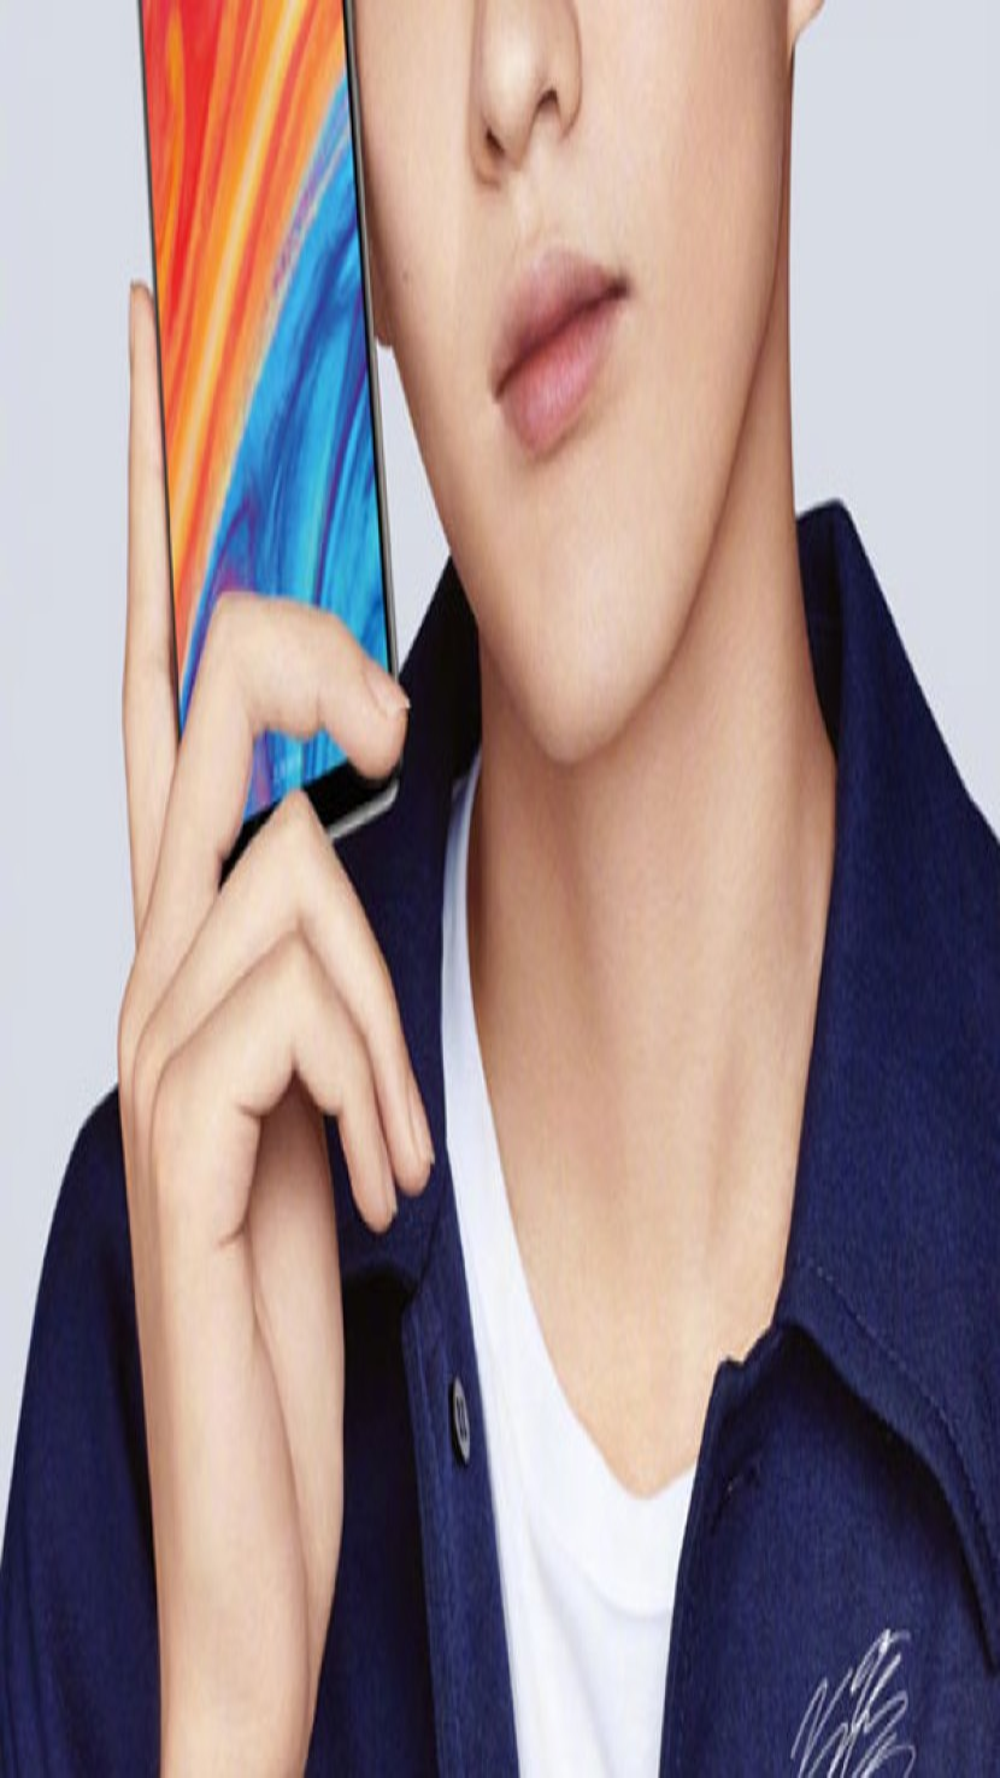 Xiaomi Mi MIX 2S: Αποκάλυπτεται στα πρώτα επίσημα posters της εταιρείας!